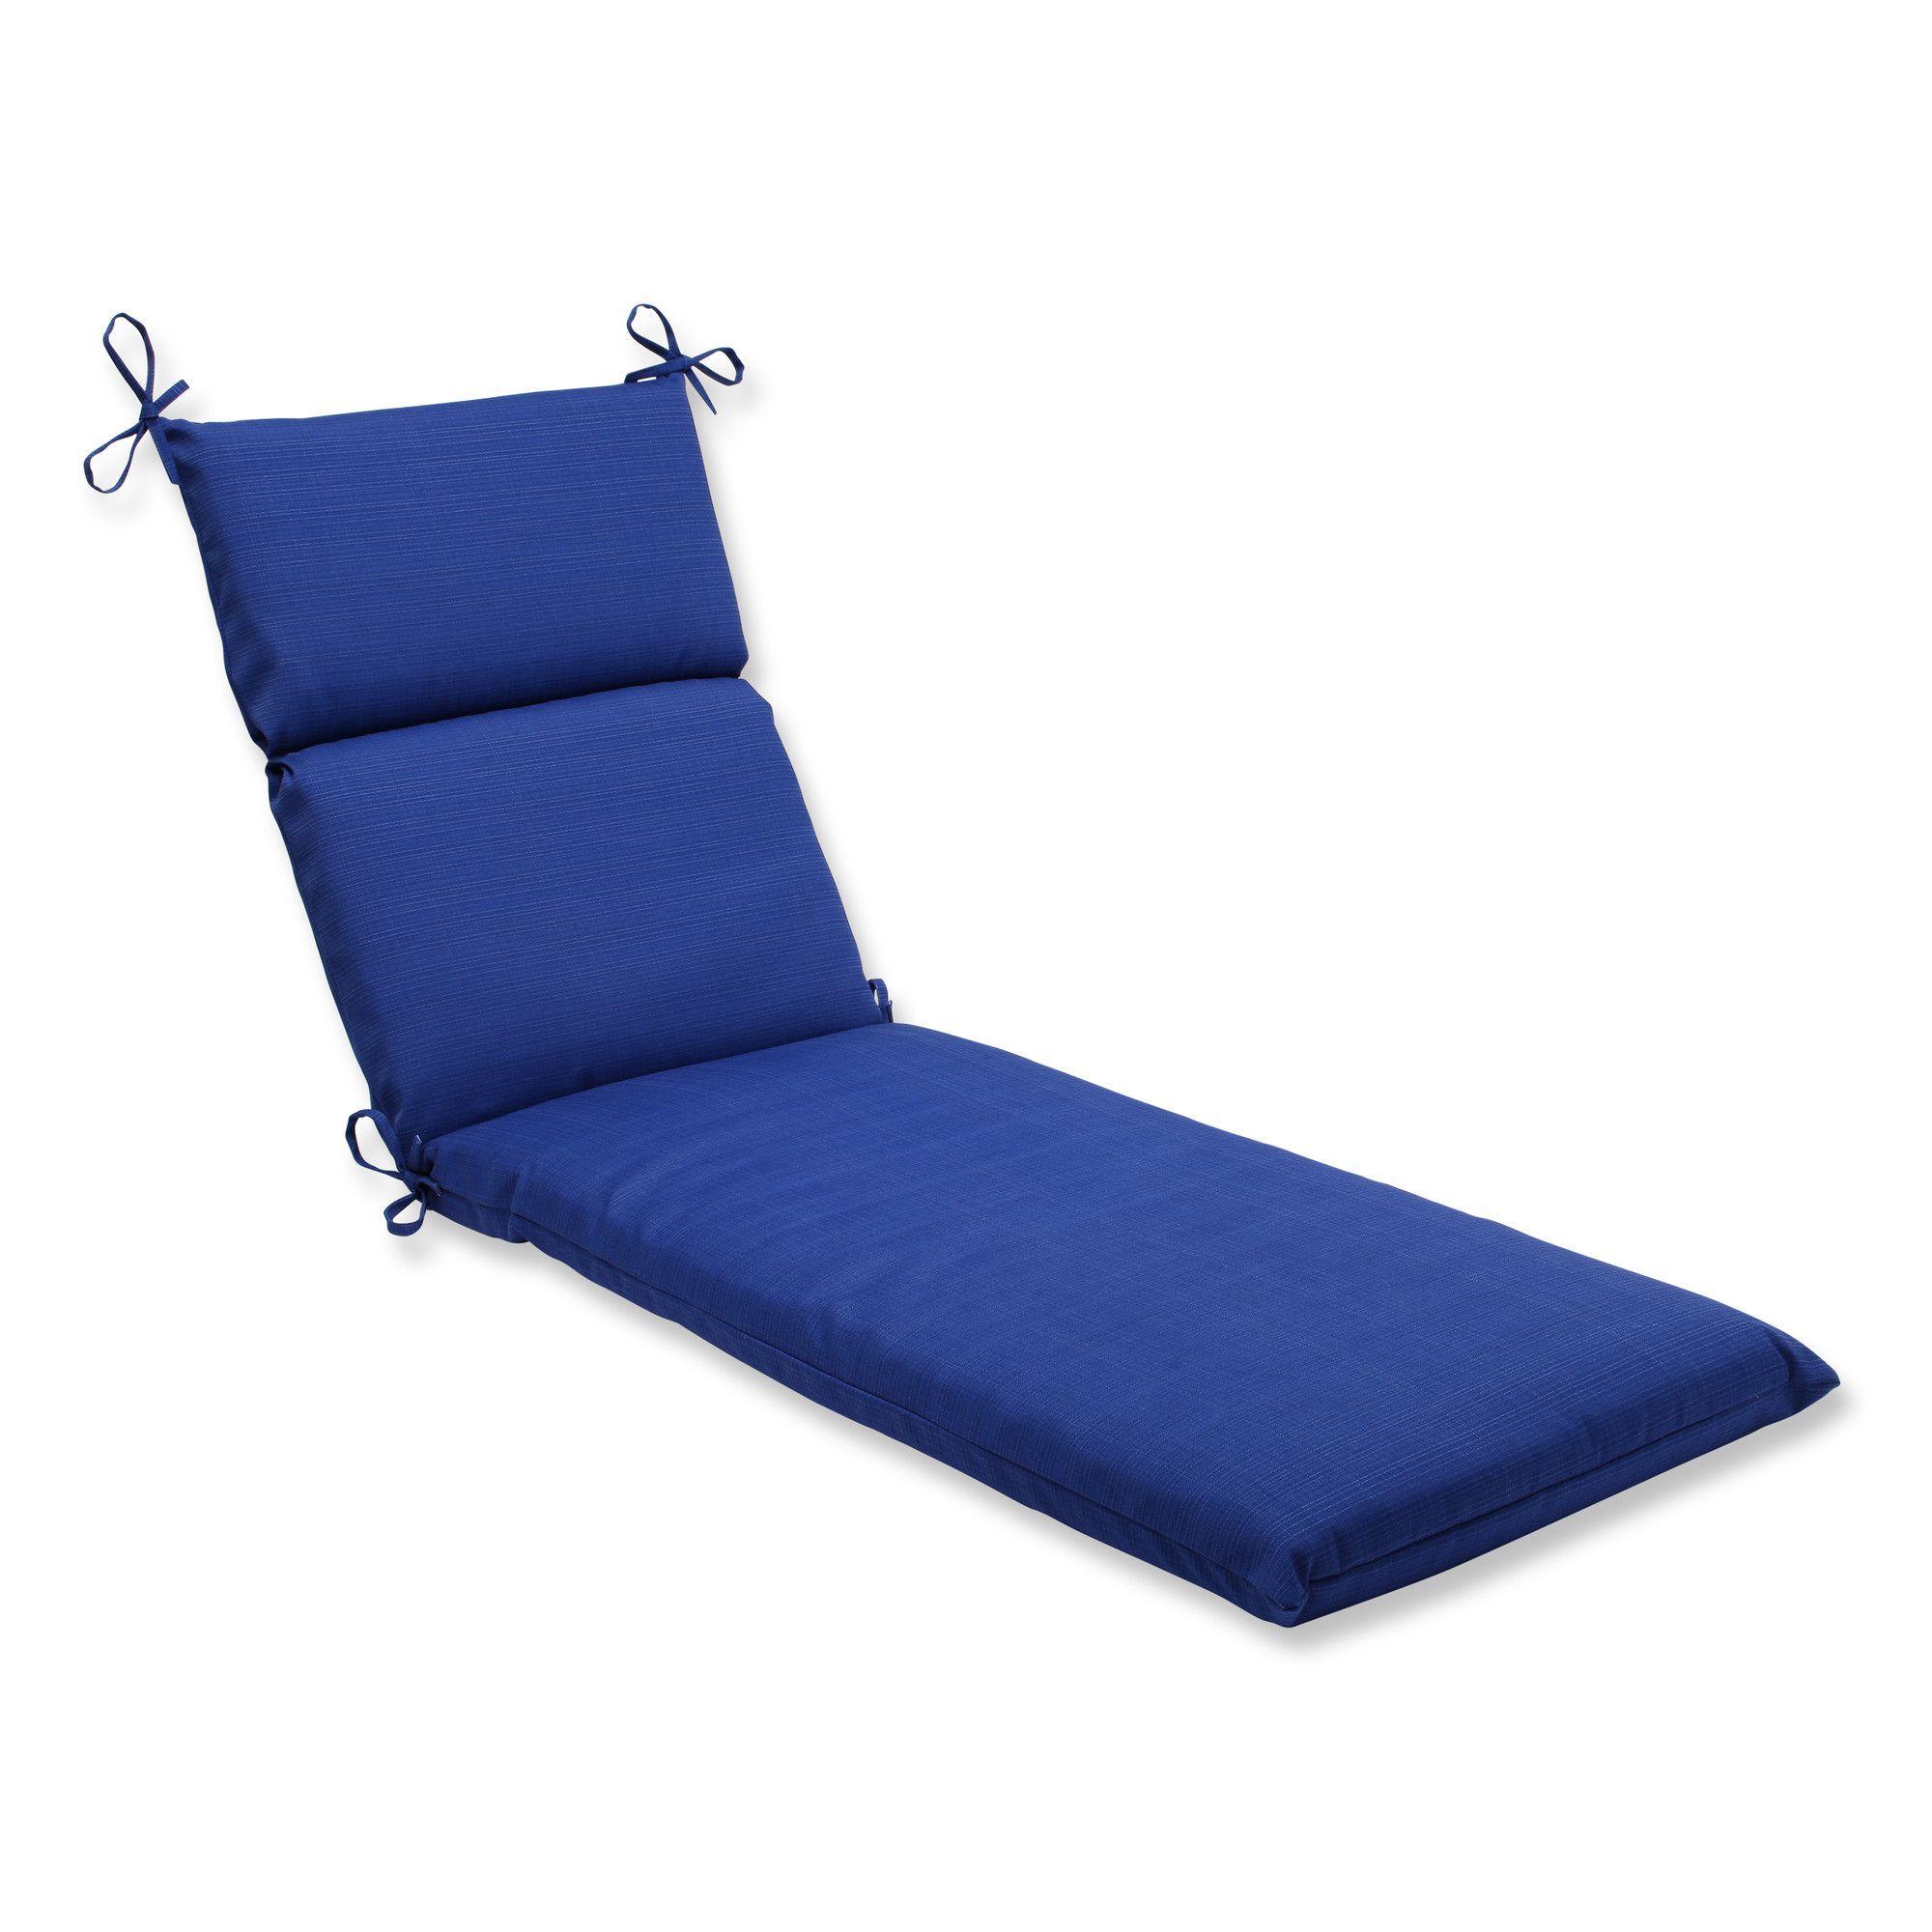 Fresco Outdoor Chaise Lounge Cushion